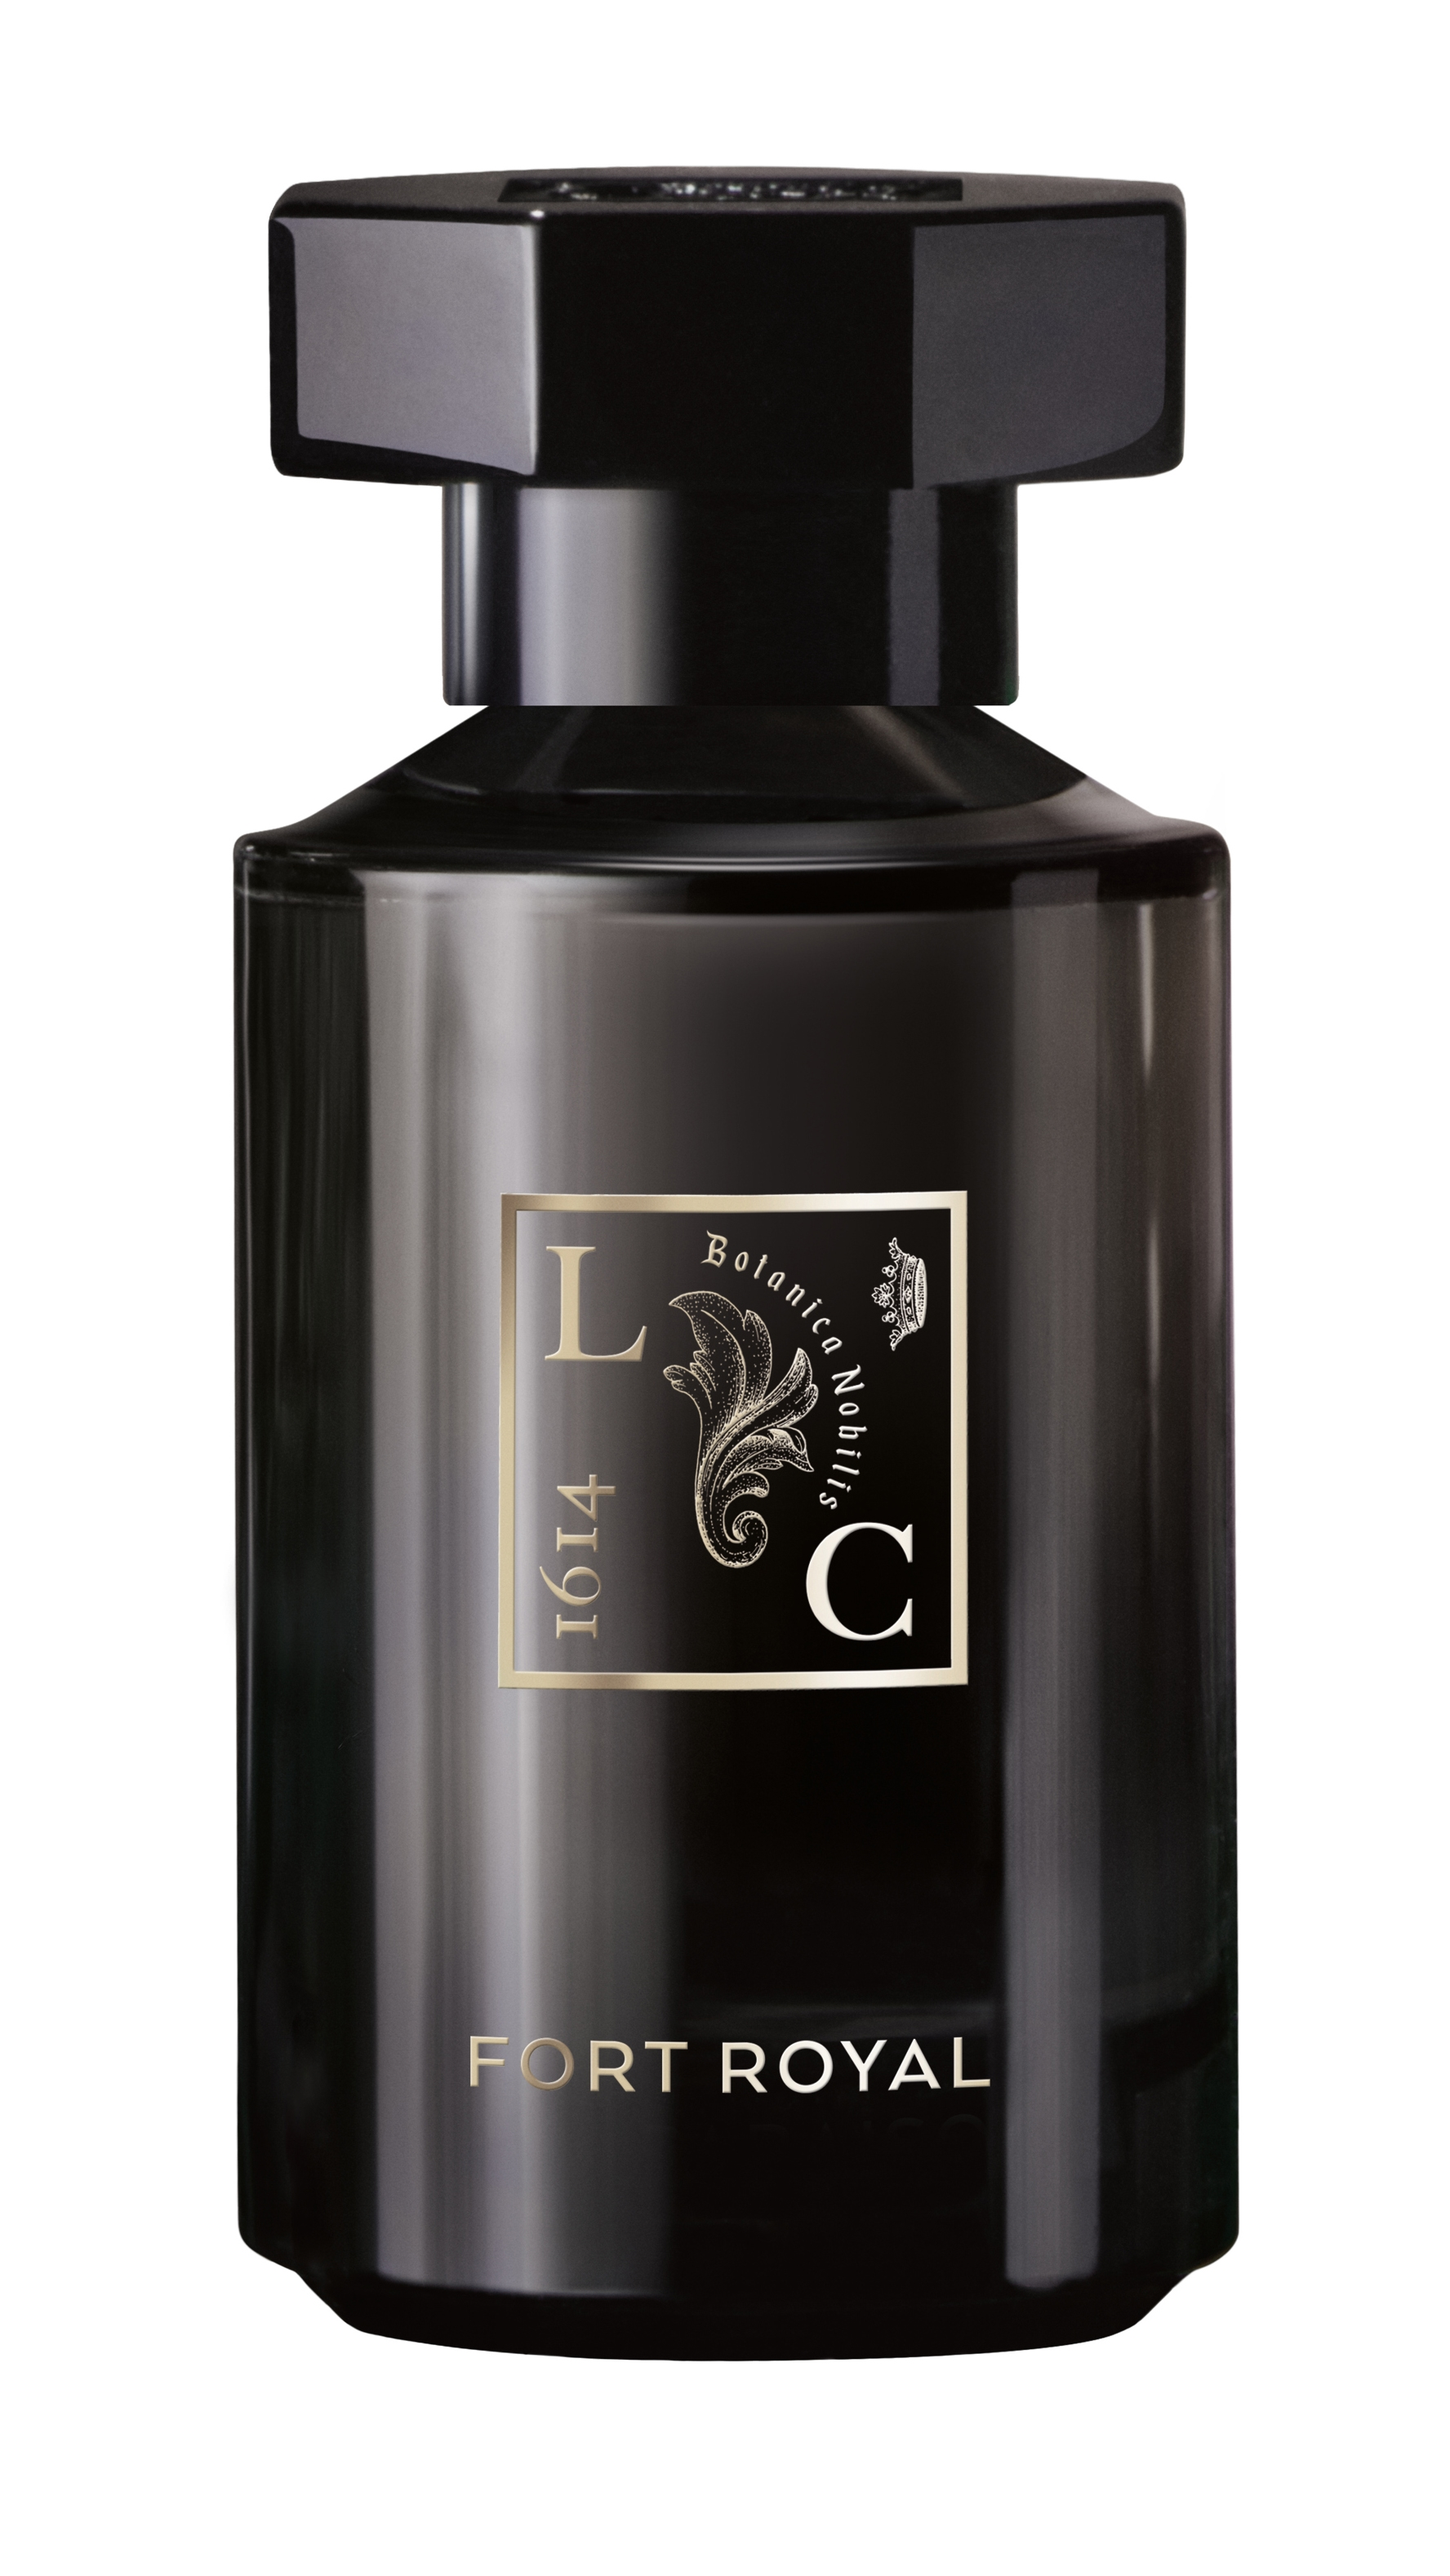 Remarkable Perfume Fort Royal Edp 50ml